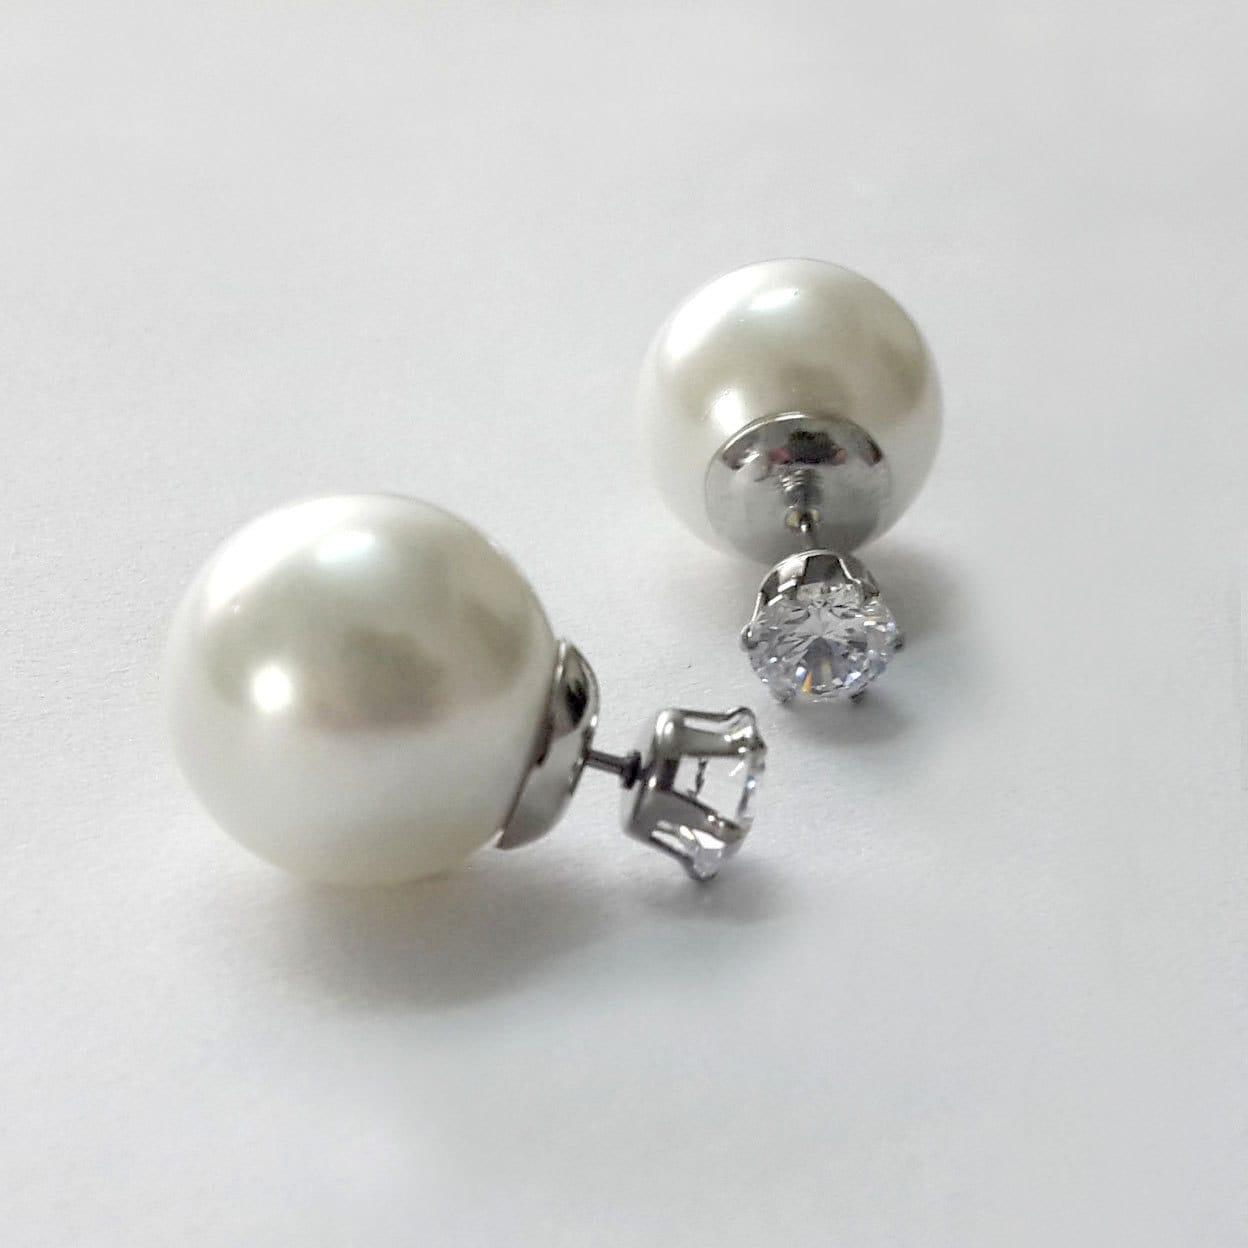 Double Sided Earrings Double Pearl Studs Double Pearl